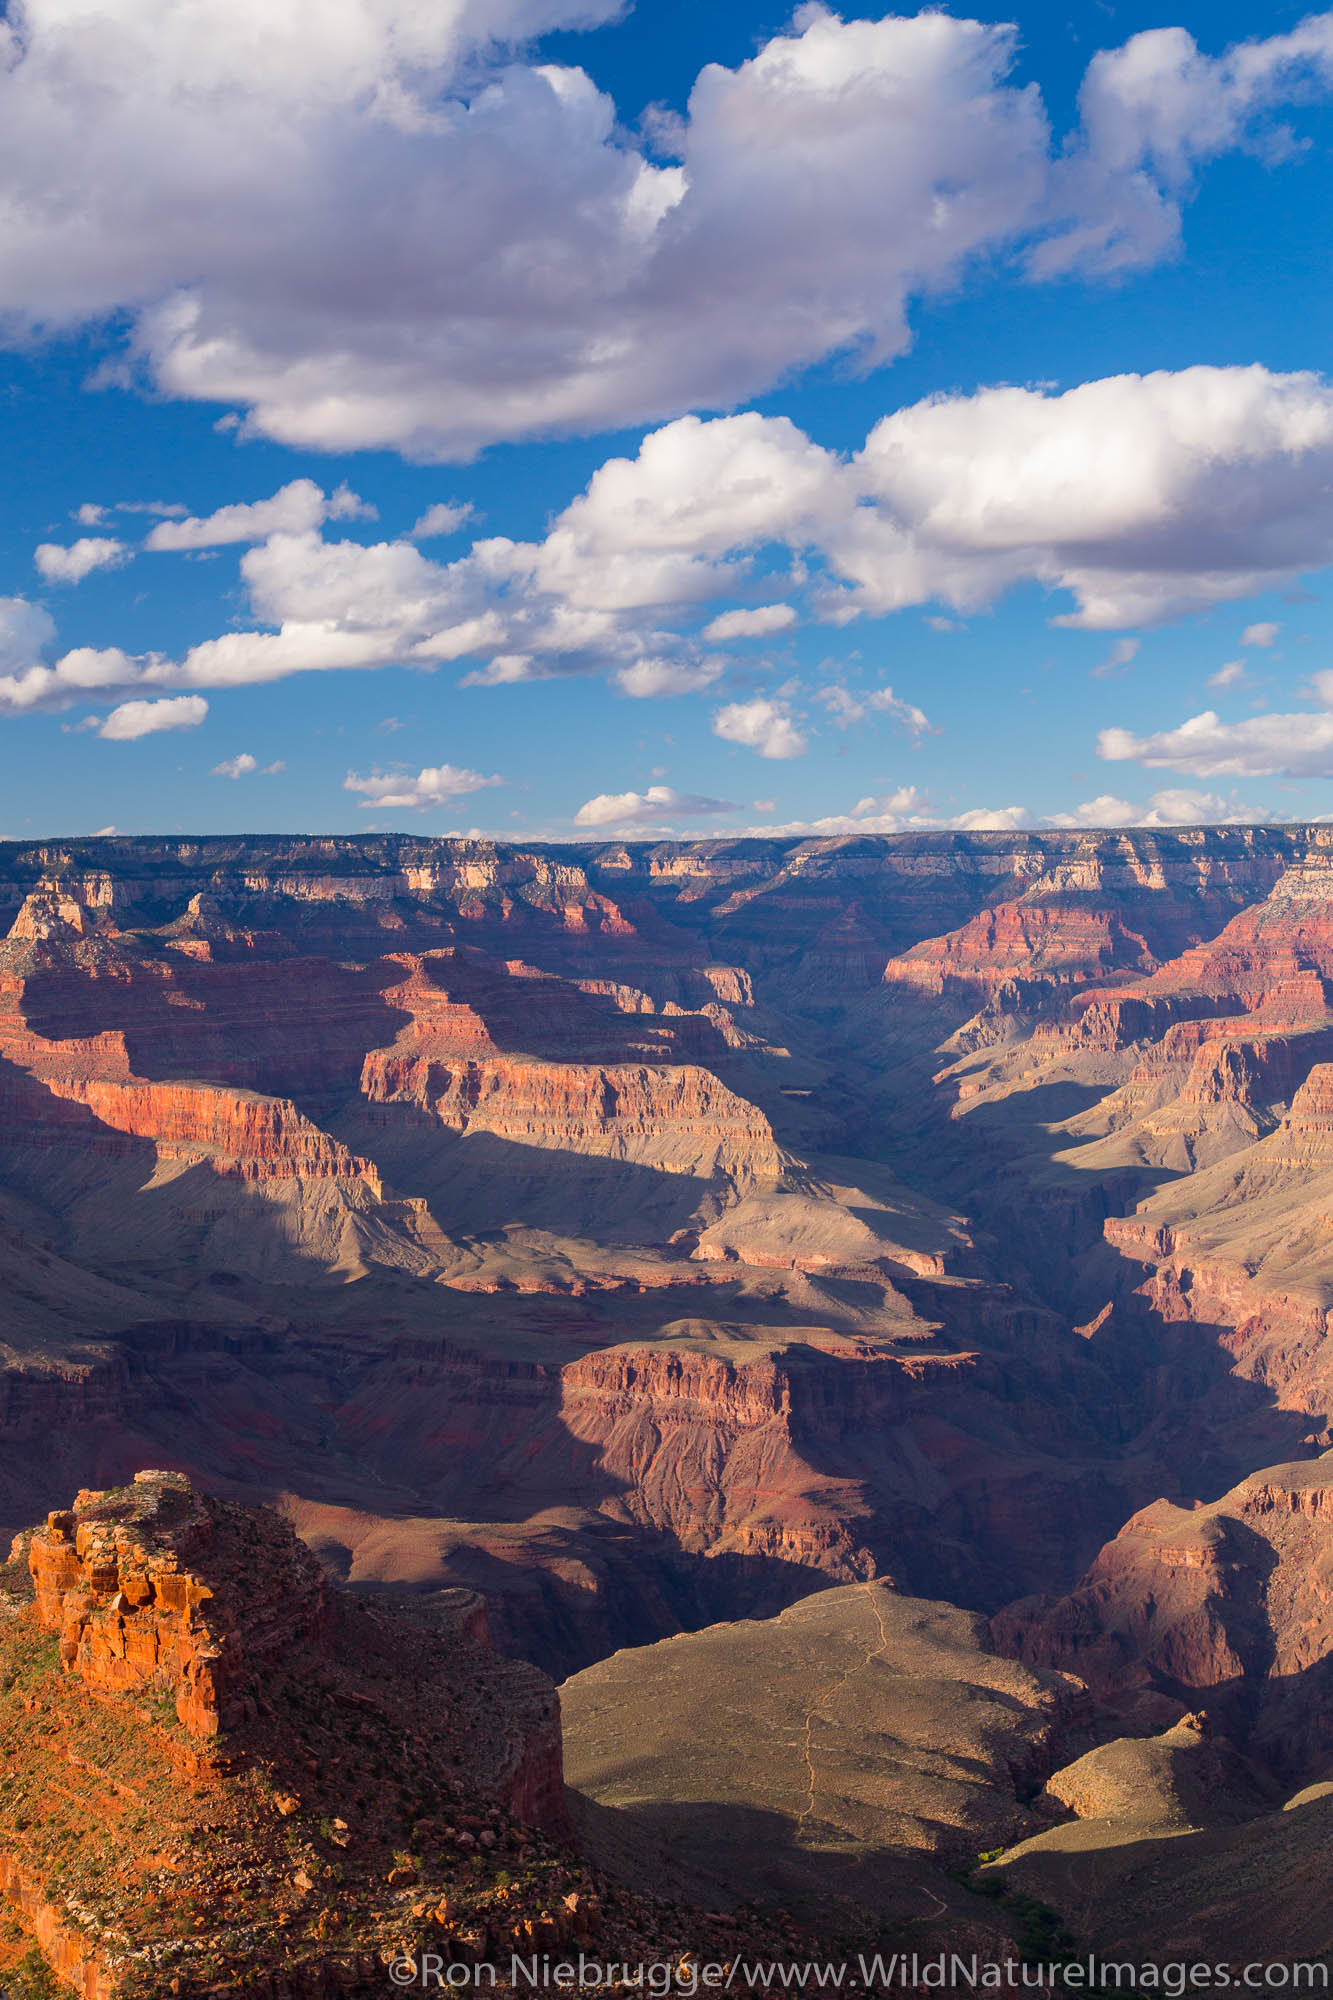 Trailview Overlook, Grand Canyon National Park, Arizona.